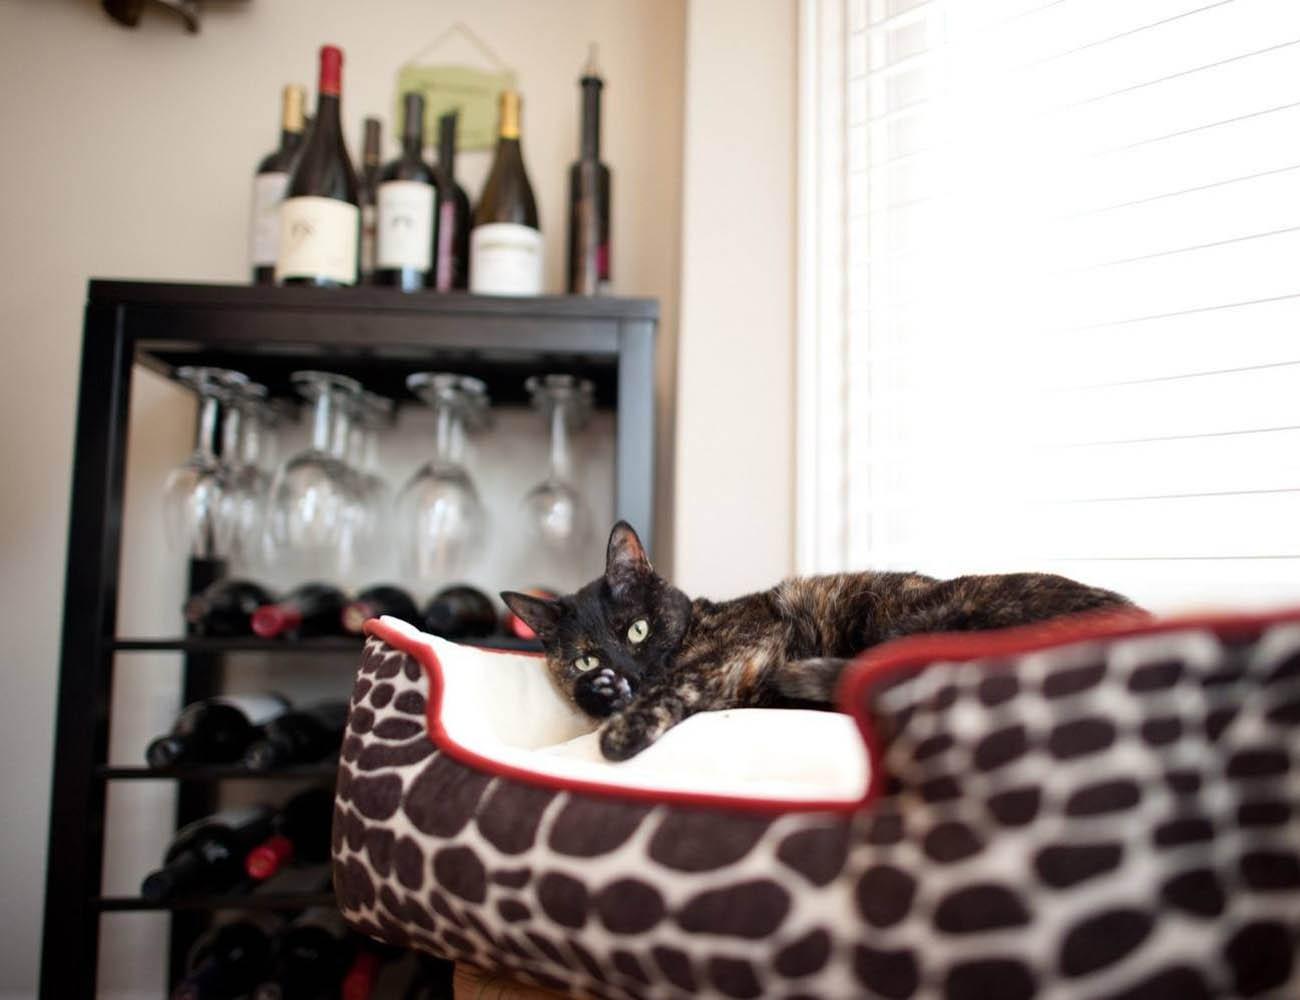 Kalahari Lounge Bed by P.L.A.Y.